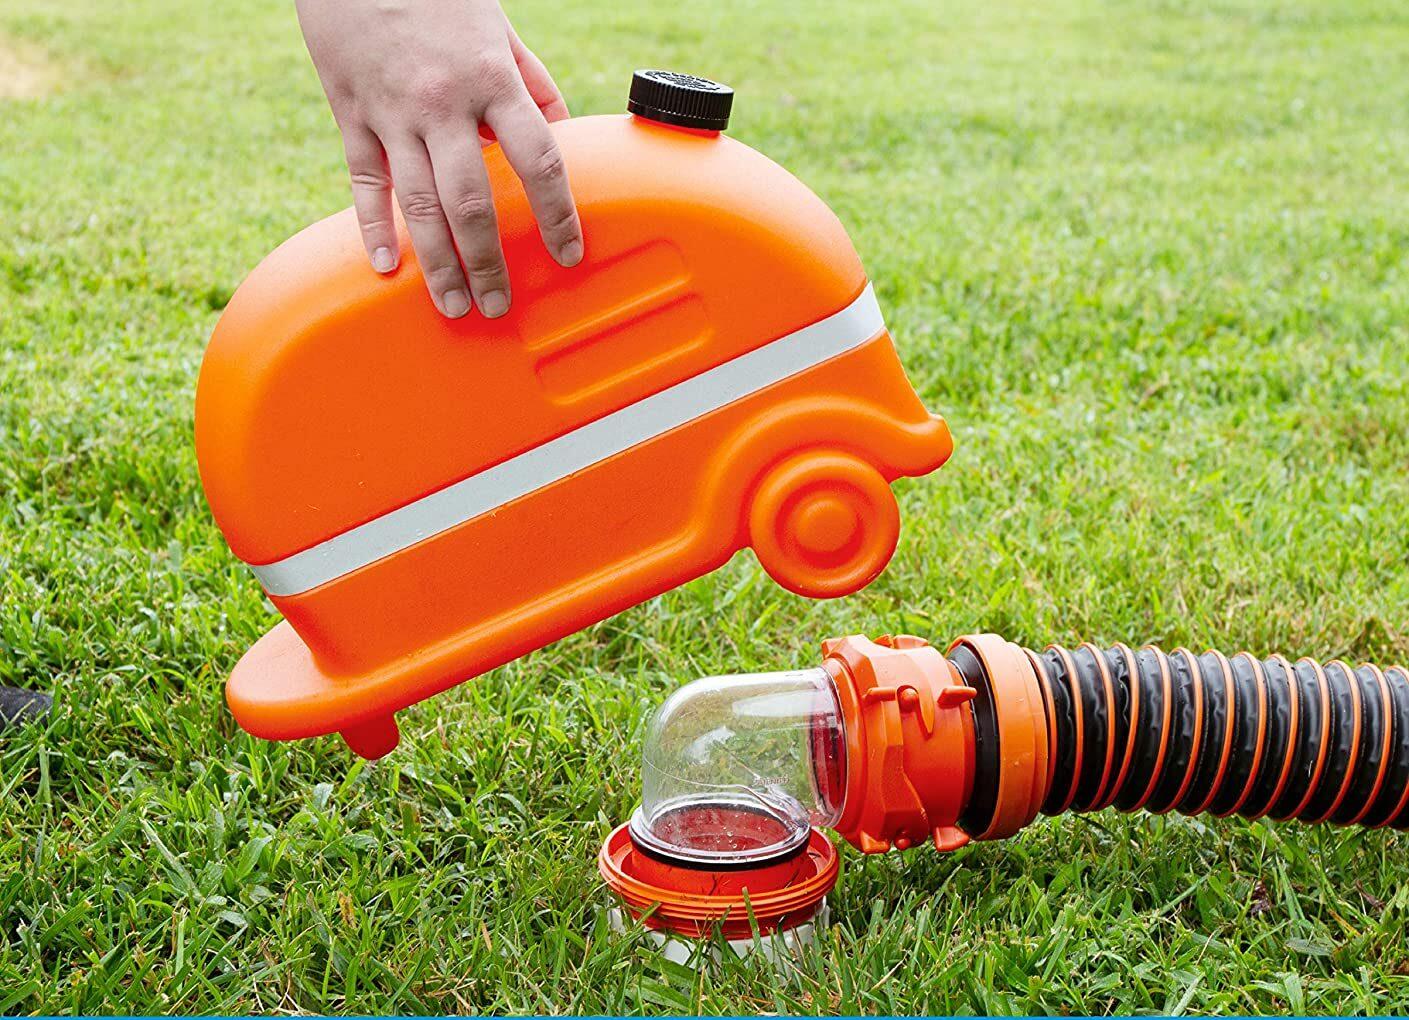 RV sewer hose weight